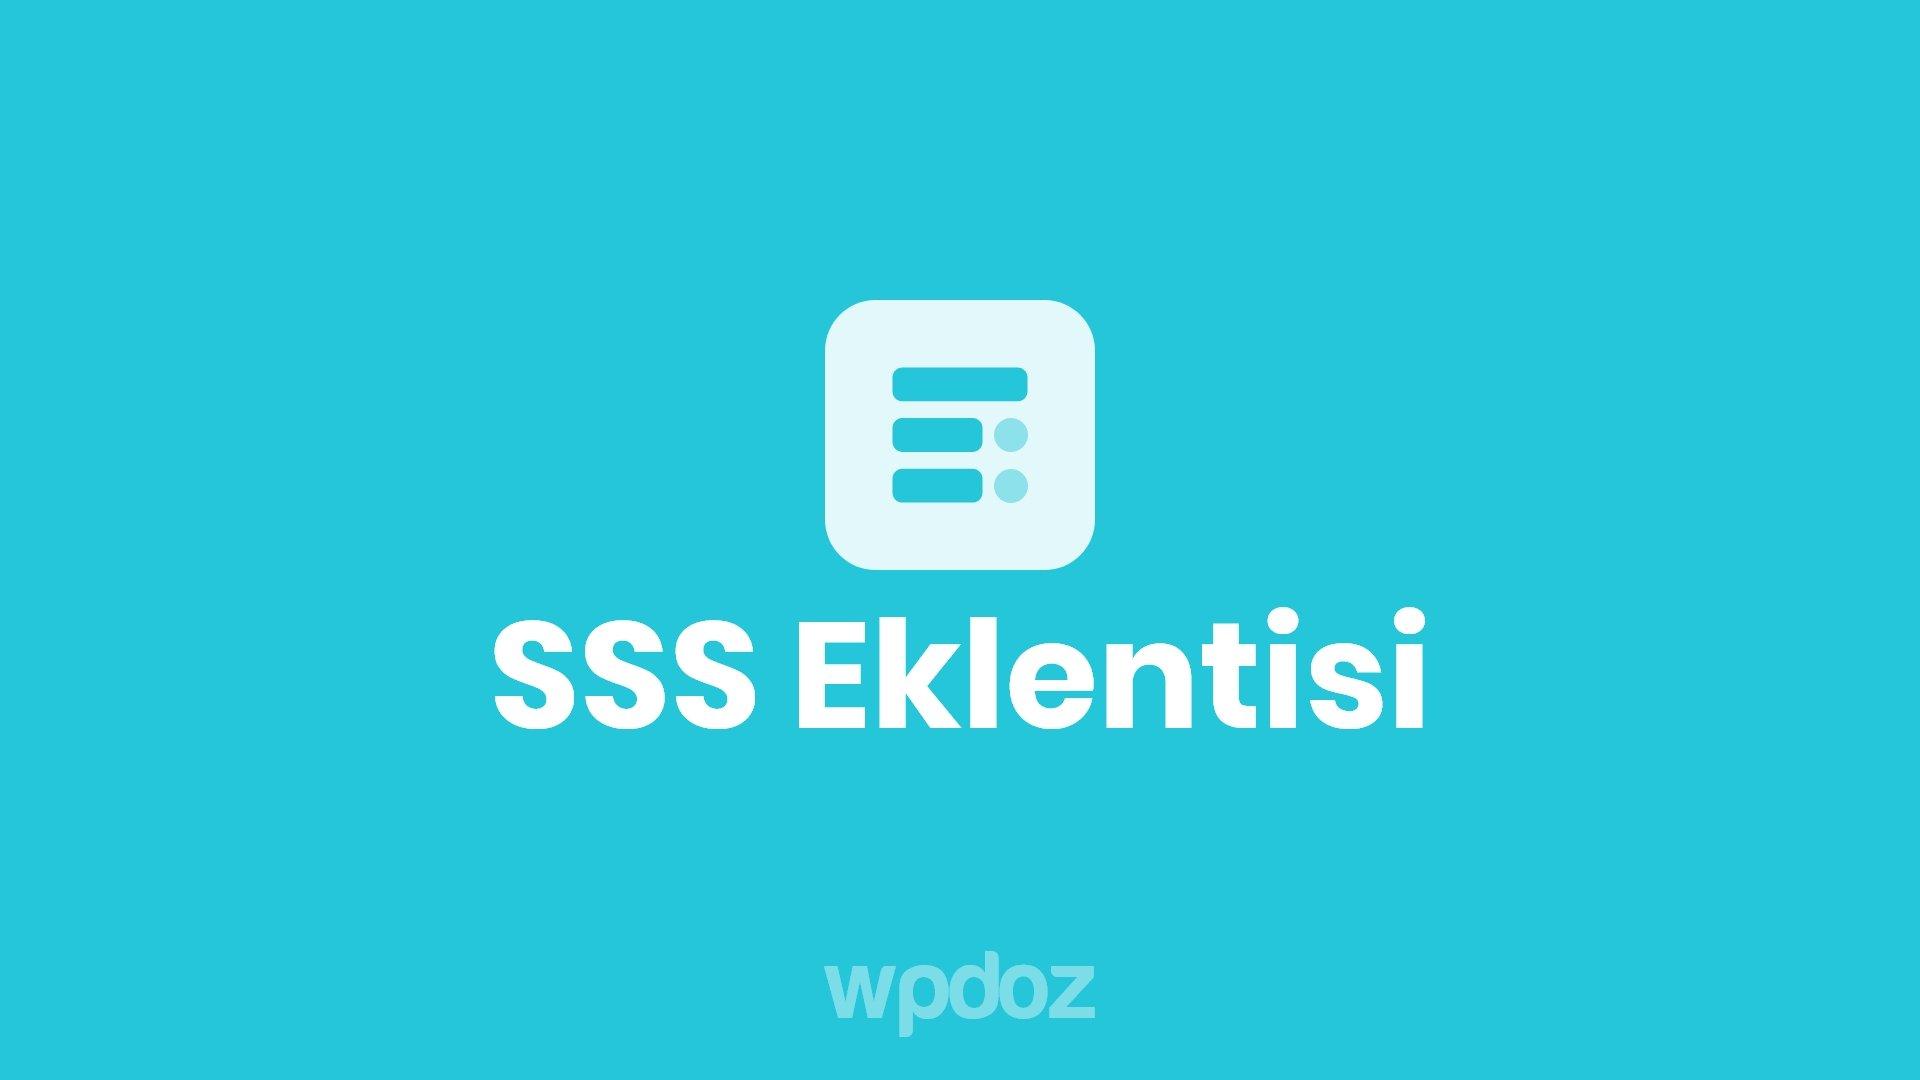 #1 WordPress En İyi SSS Eklentisi – Schema FAQ Maker Pro